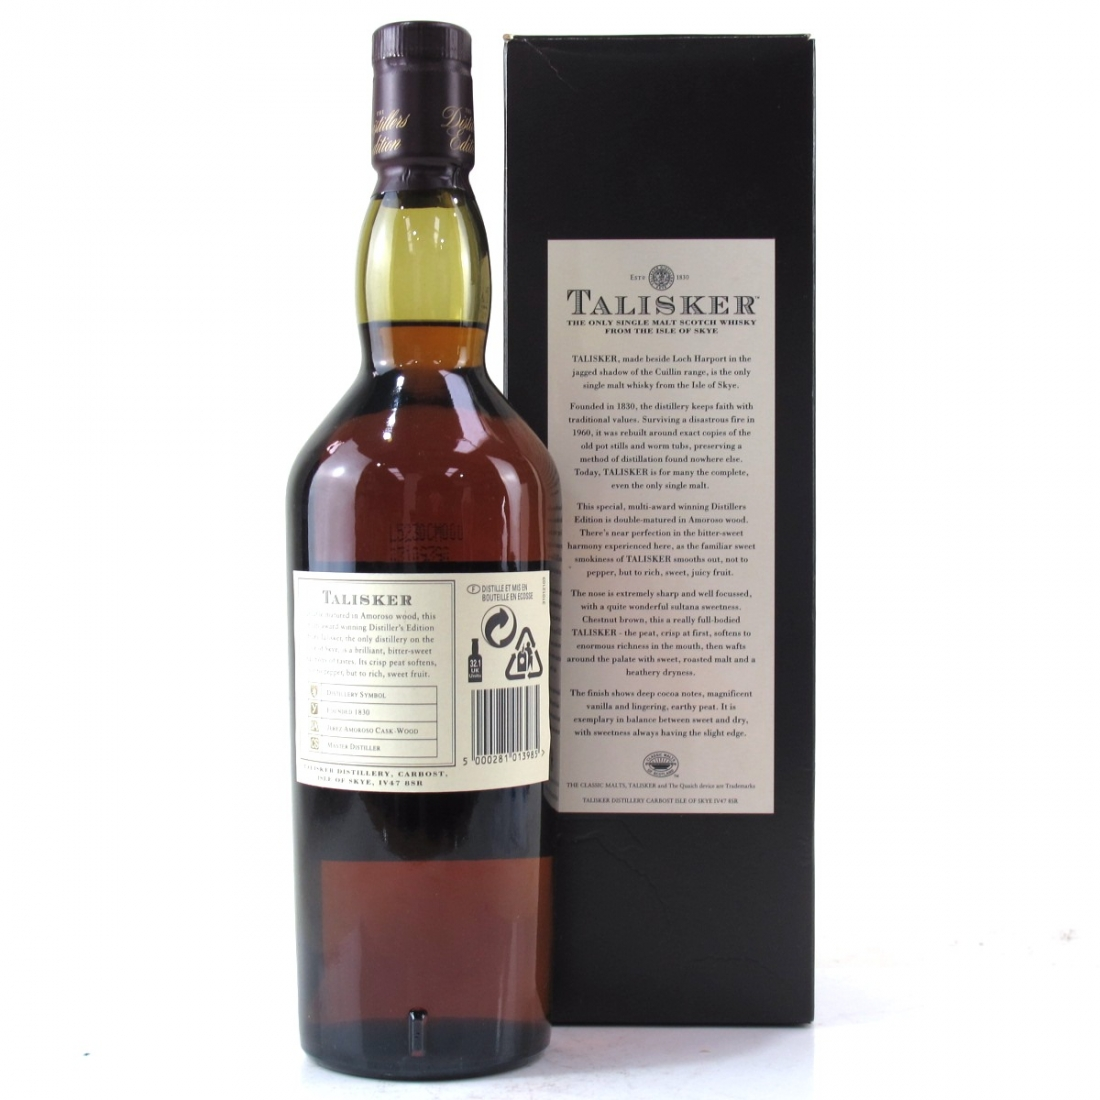 Talisker 1992 Distillers Edition 2005